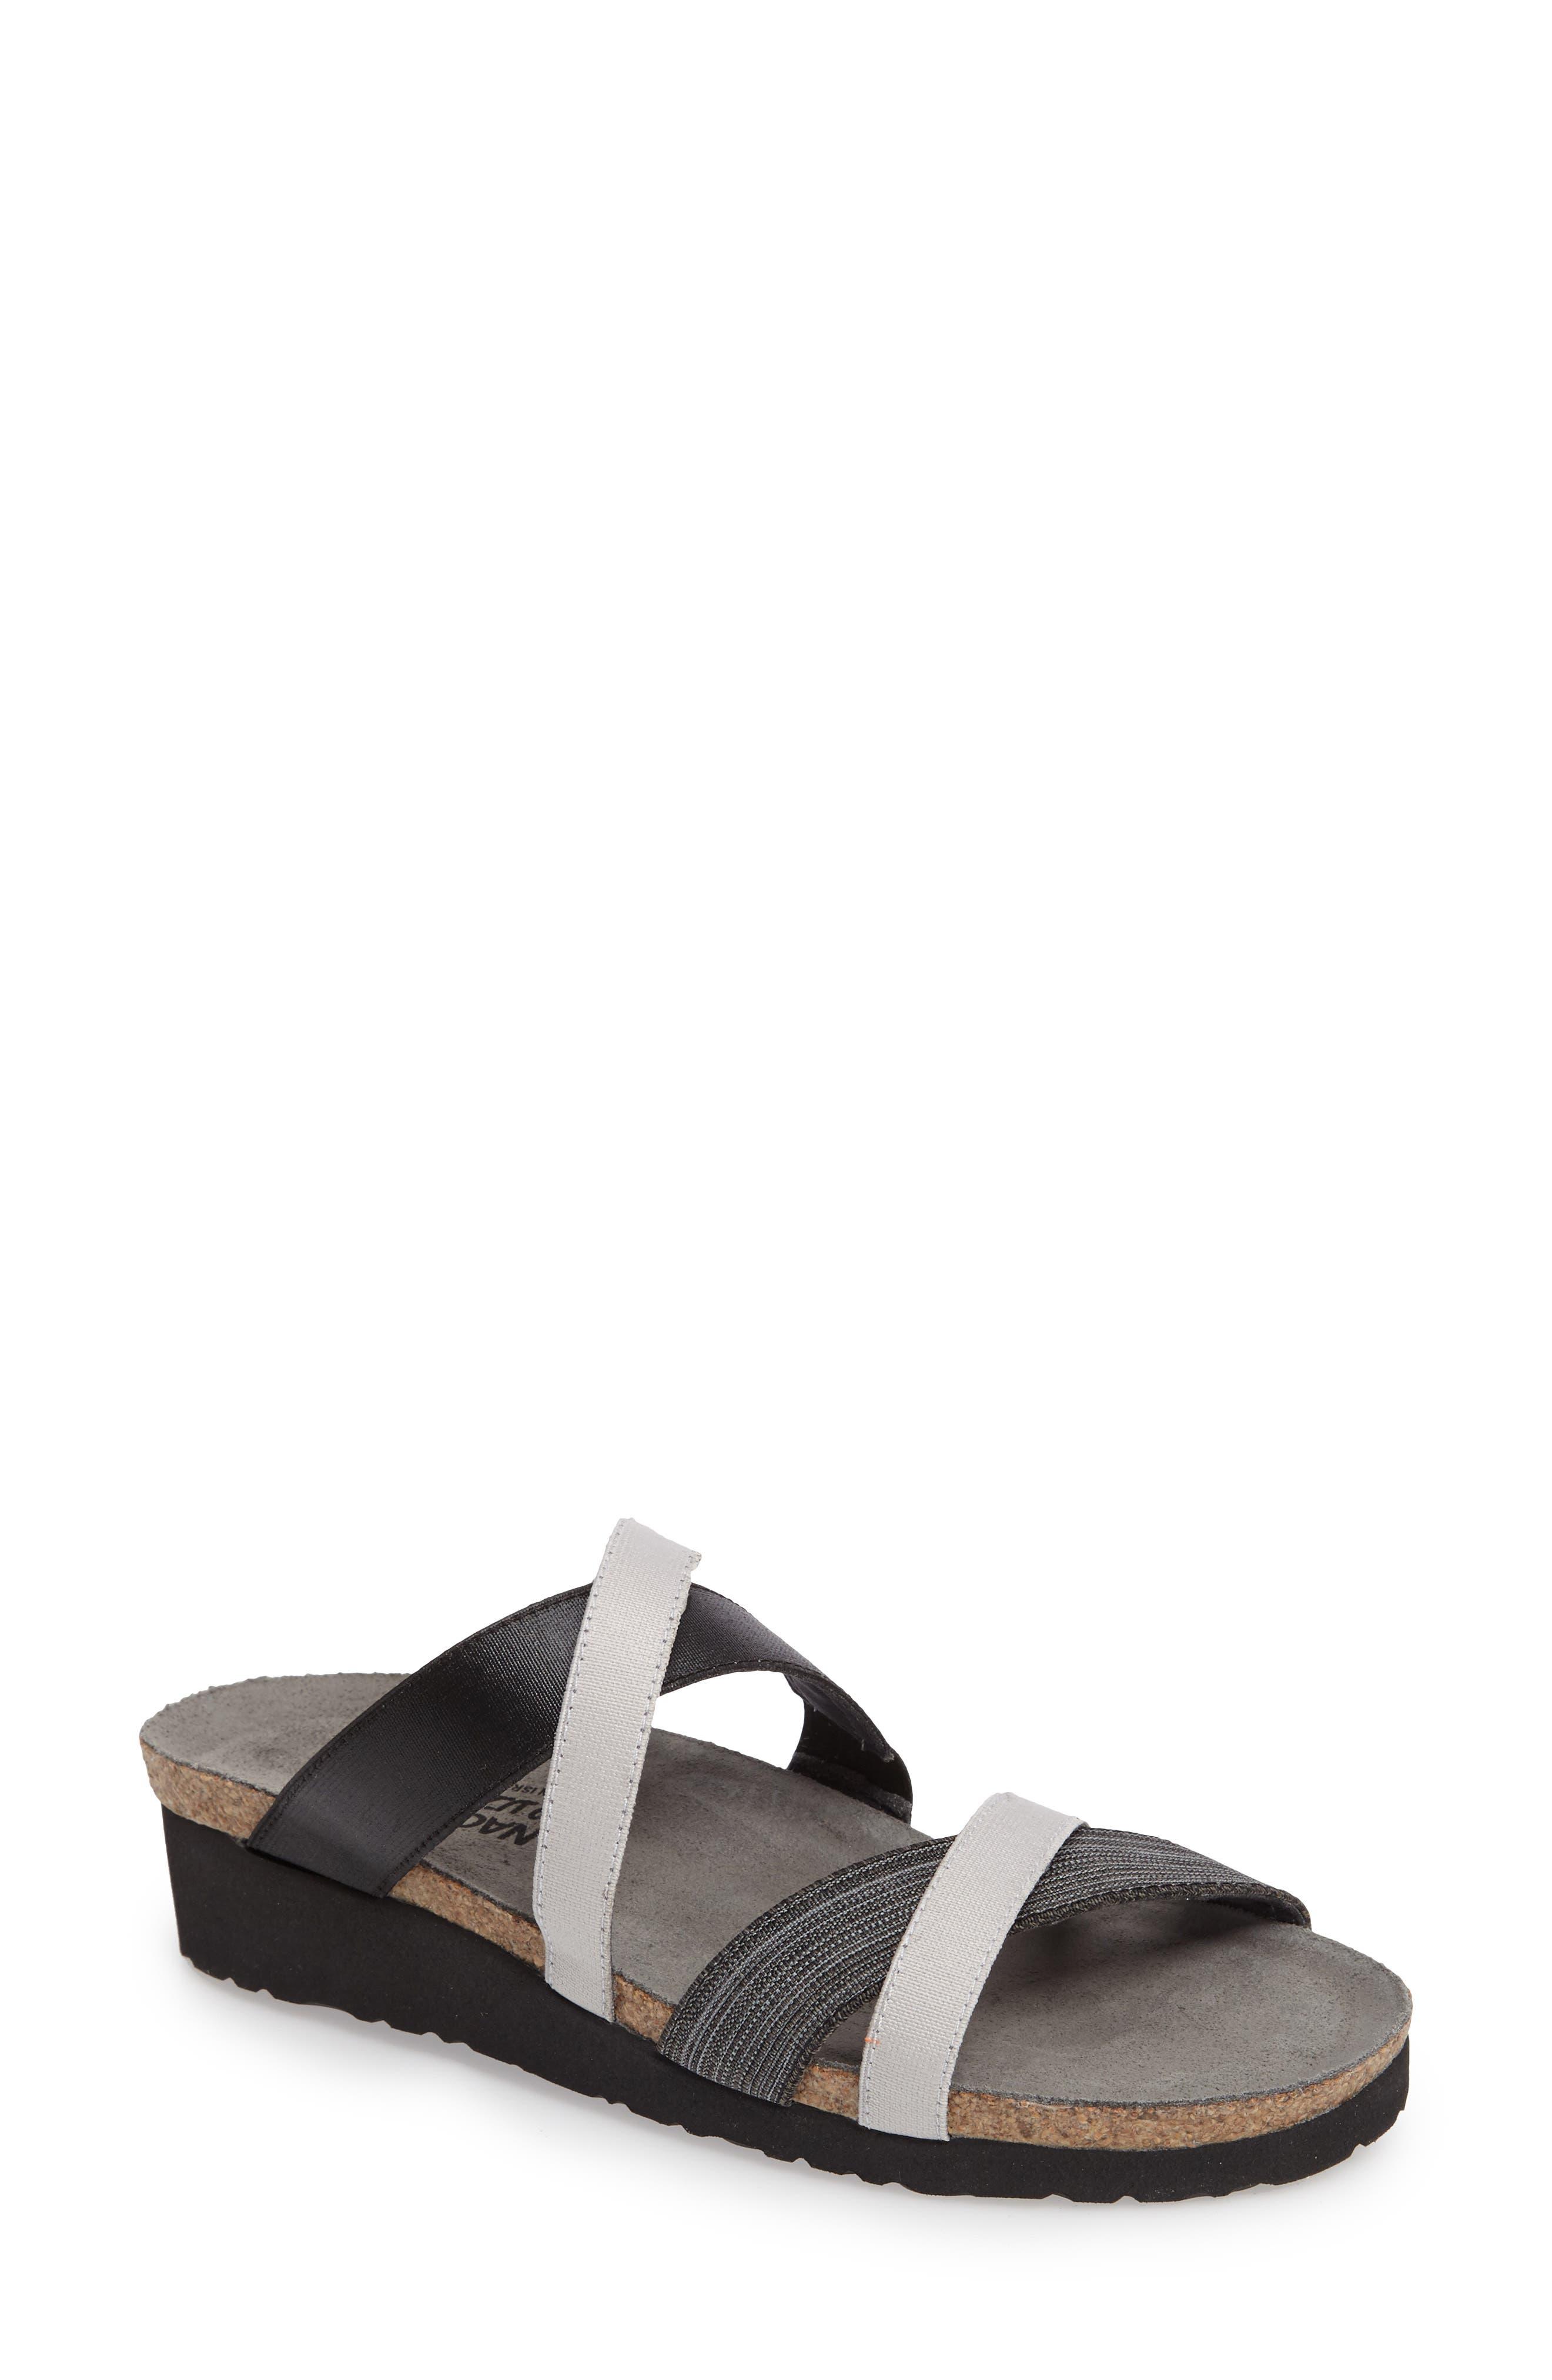 NAOT Roxana Strappy Slip-On Sandal, Main, color, BLACK/ GREY FABRIC